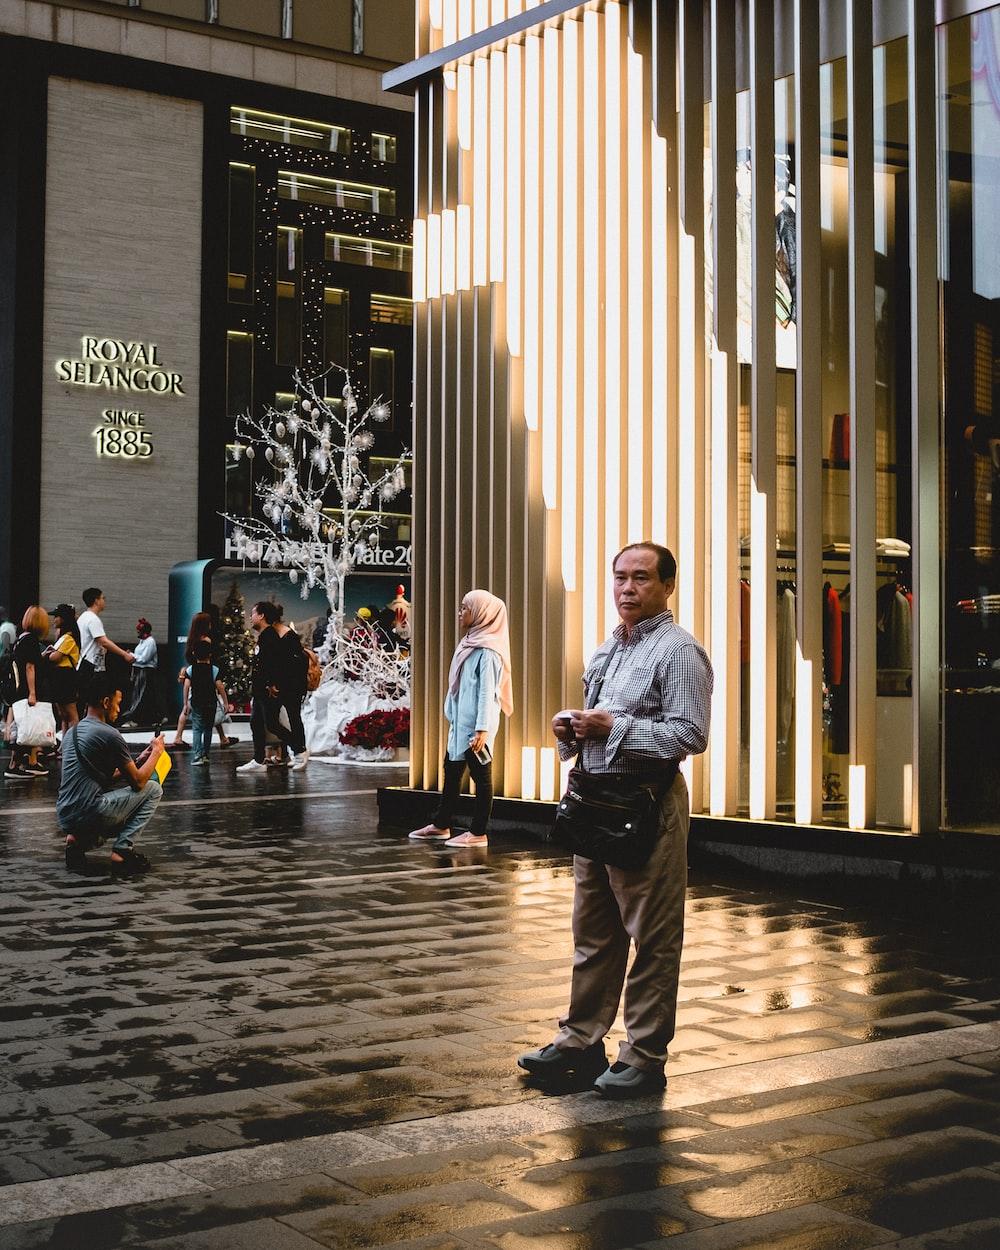 man in grey dress shirt and beige pants near people walking